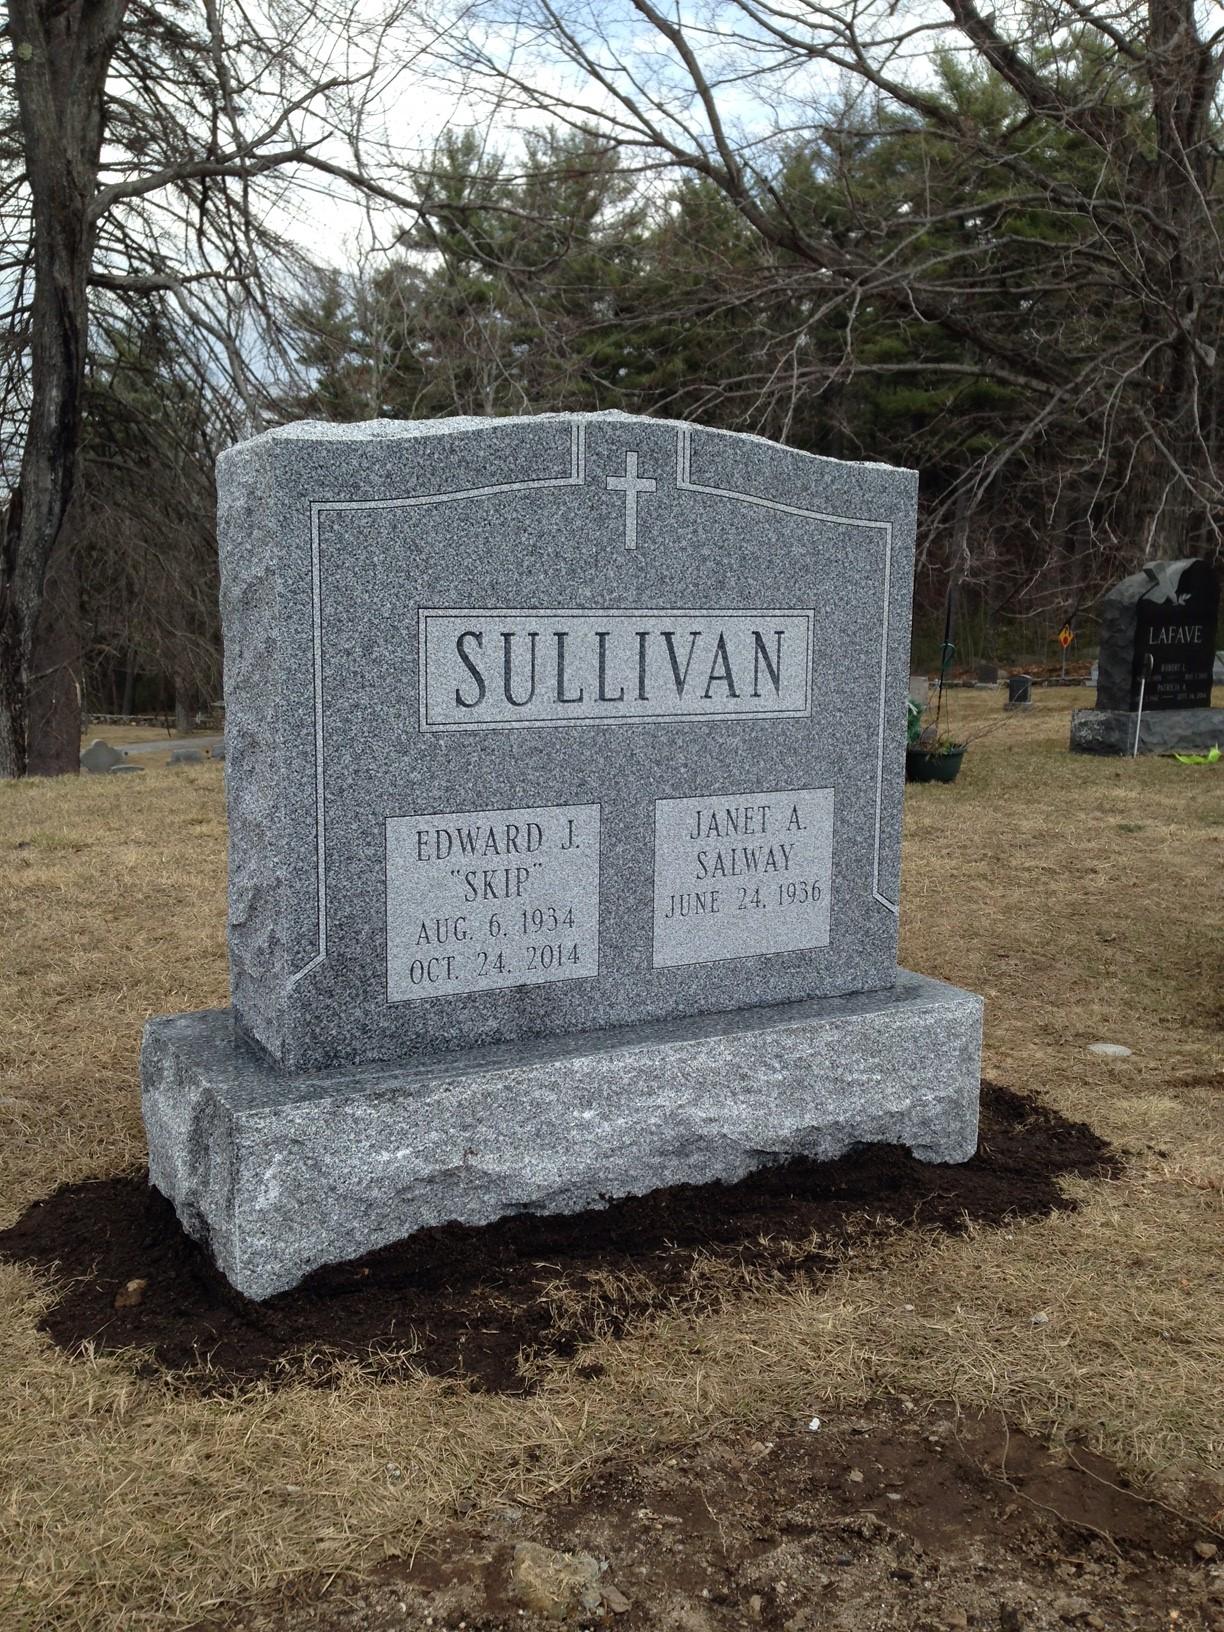 SULLIVAN Barre Gray.JPG